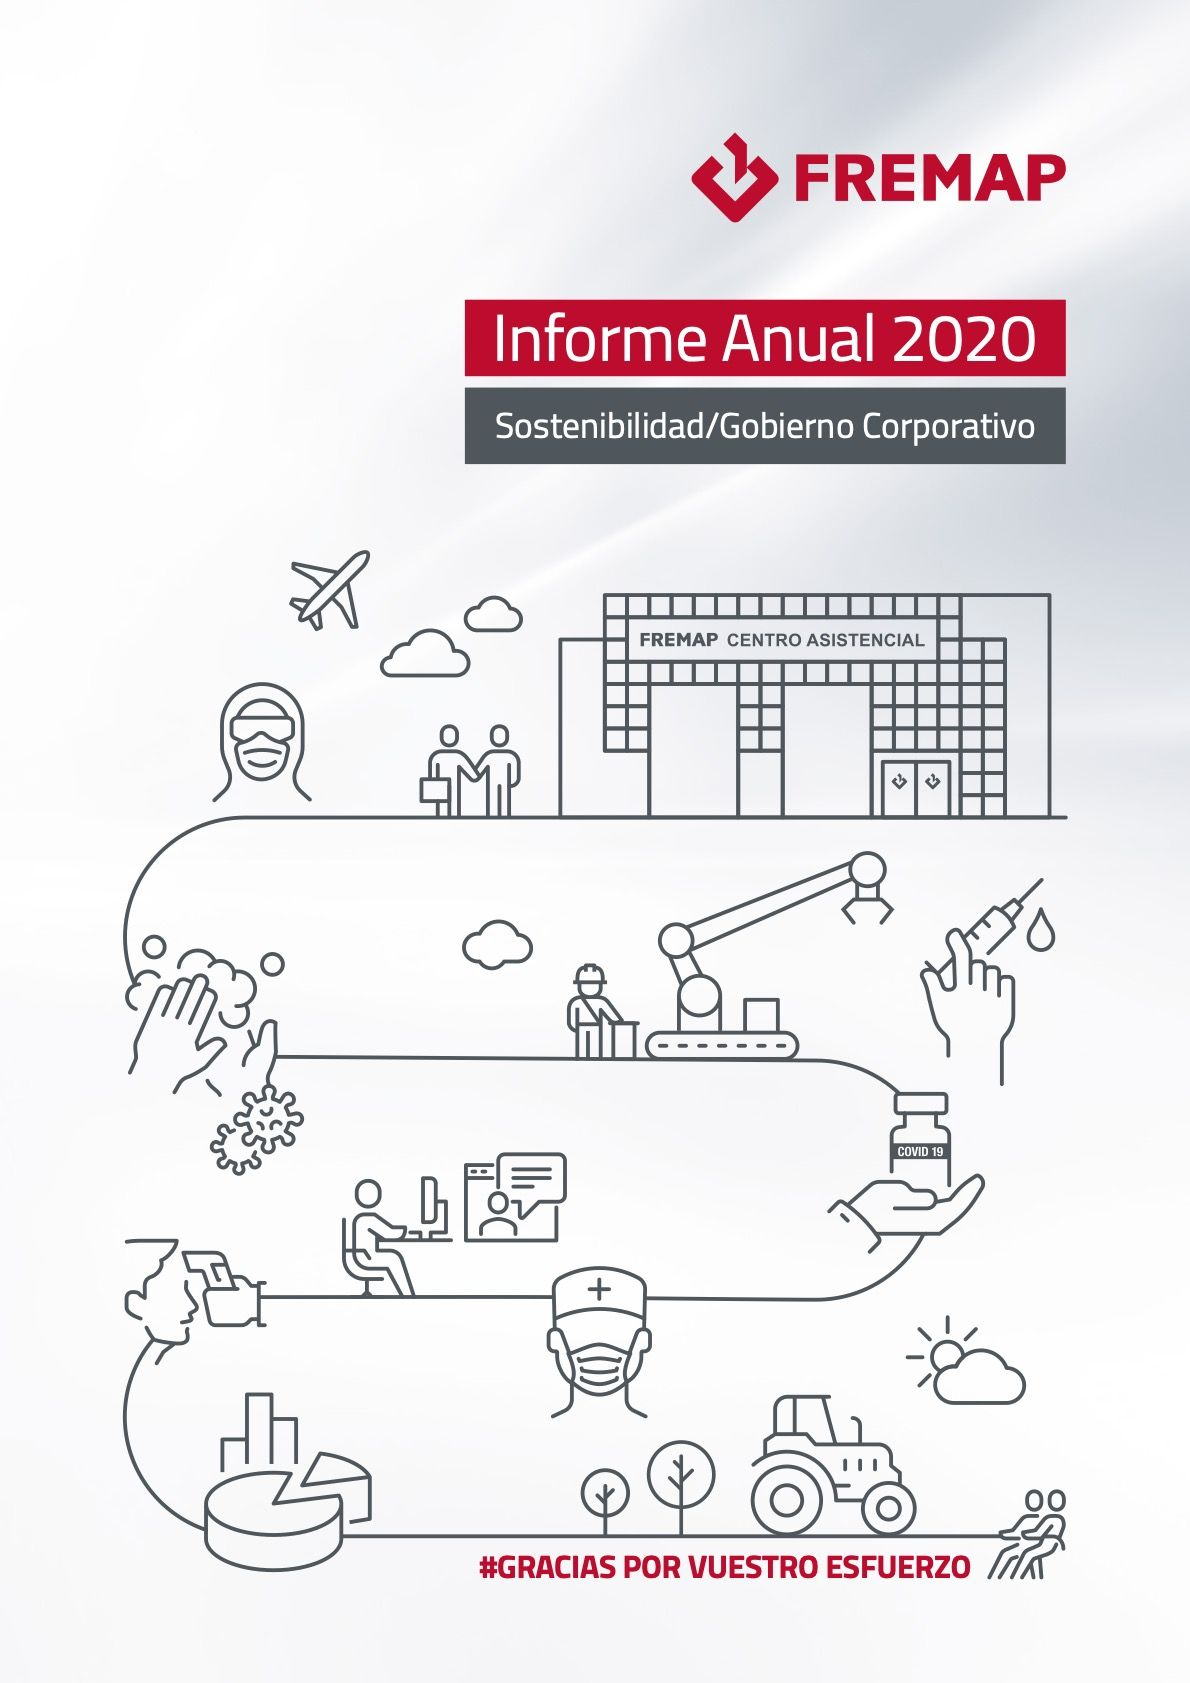 Fotografia Informe Anual 2020 FREMAP